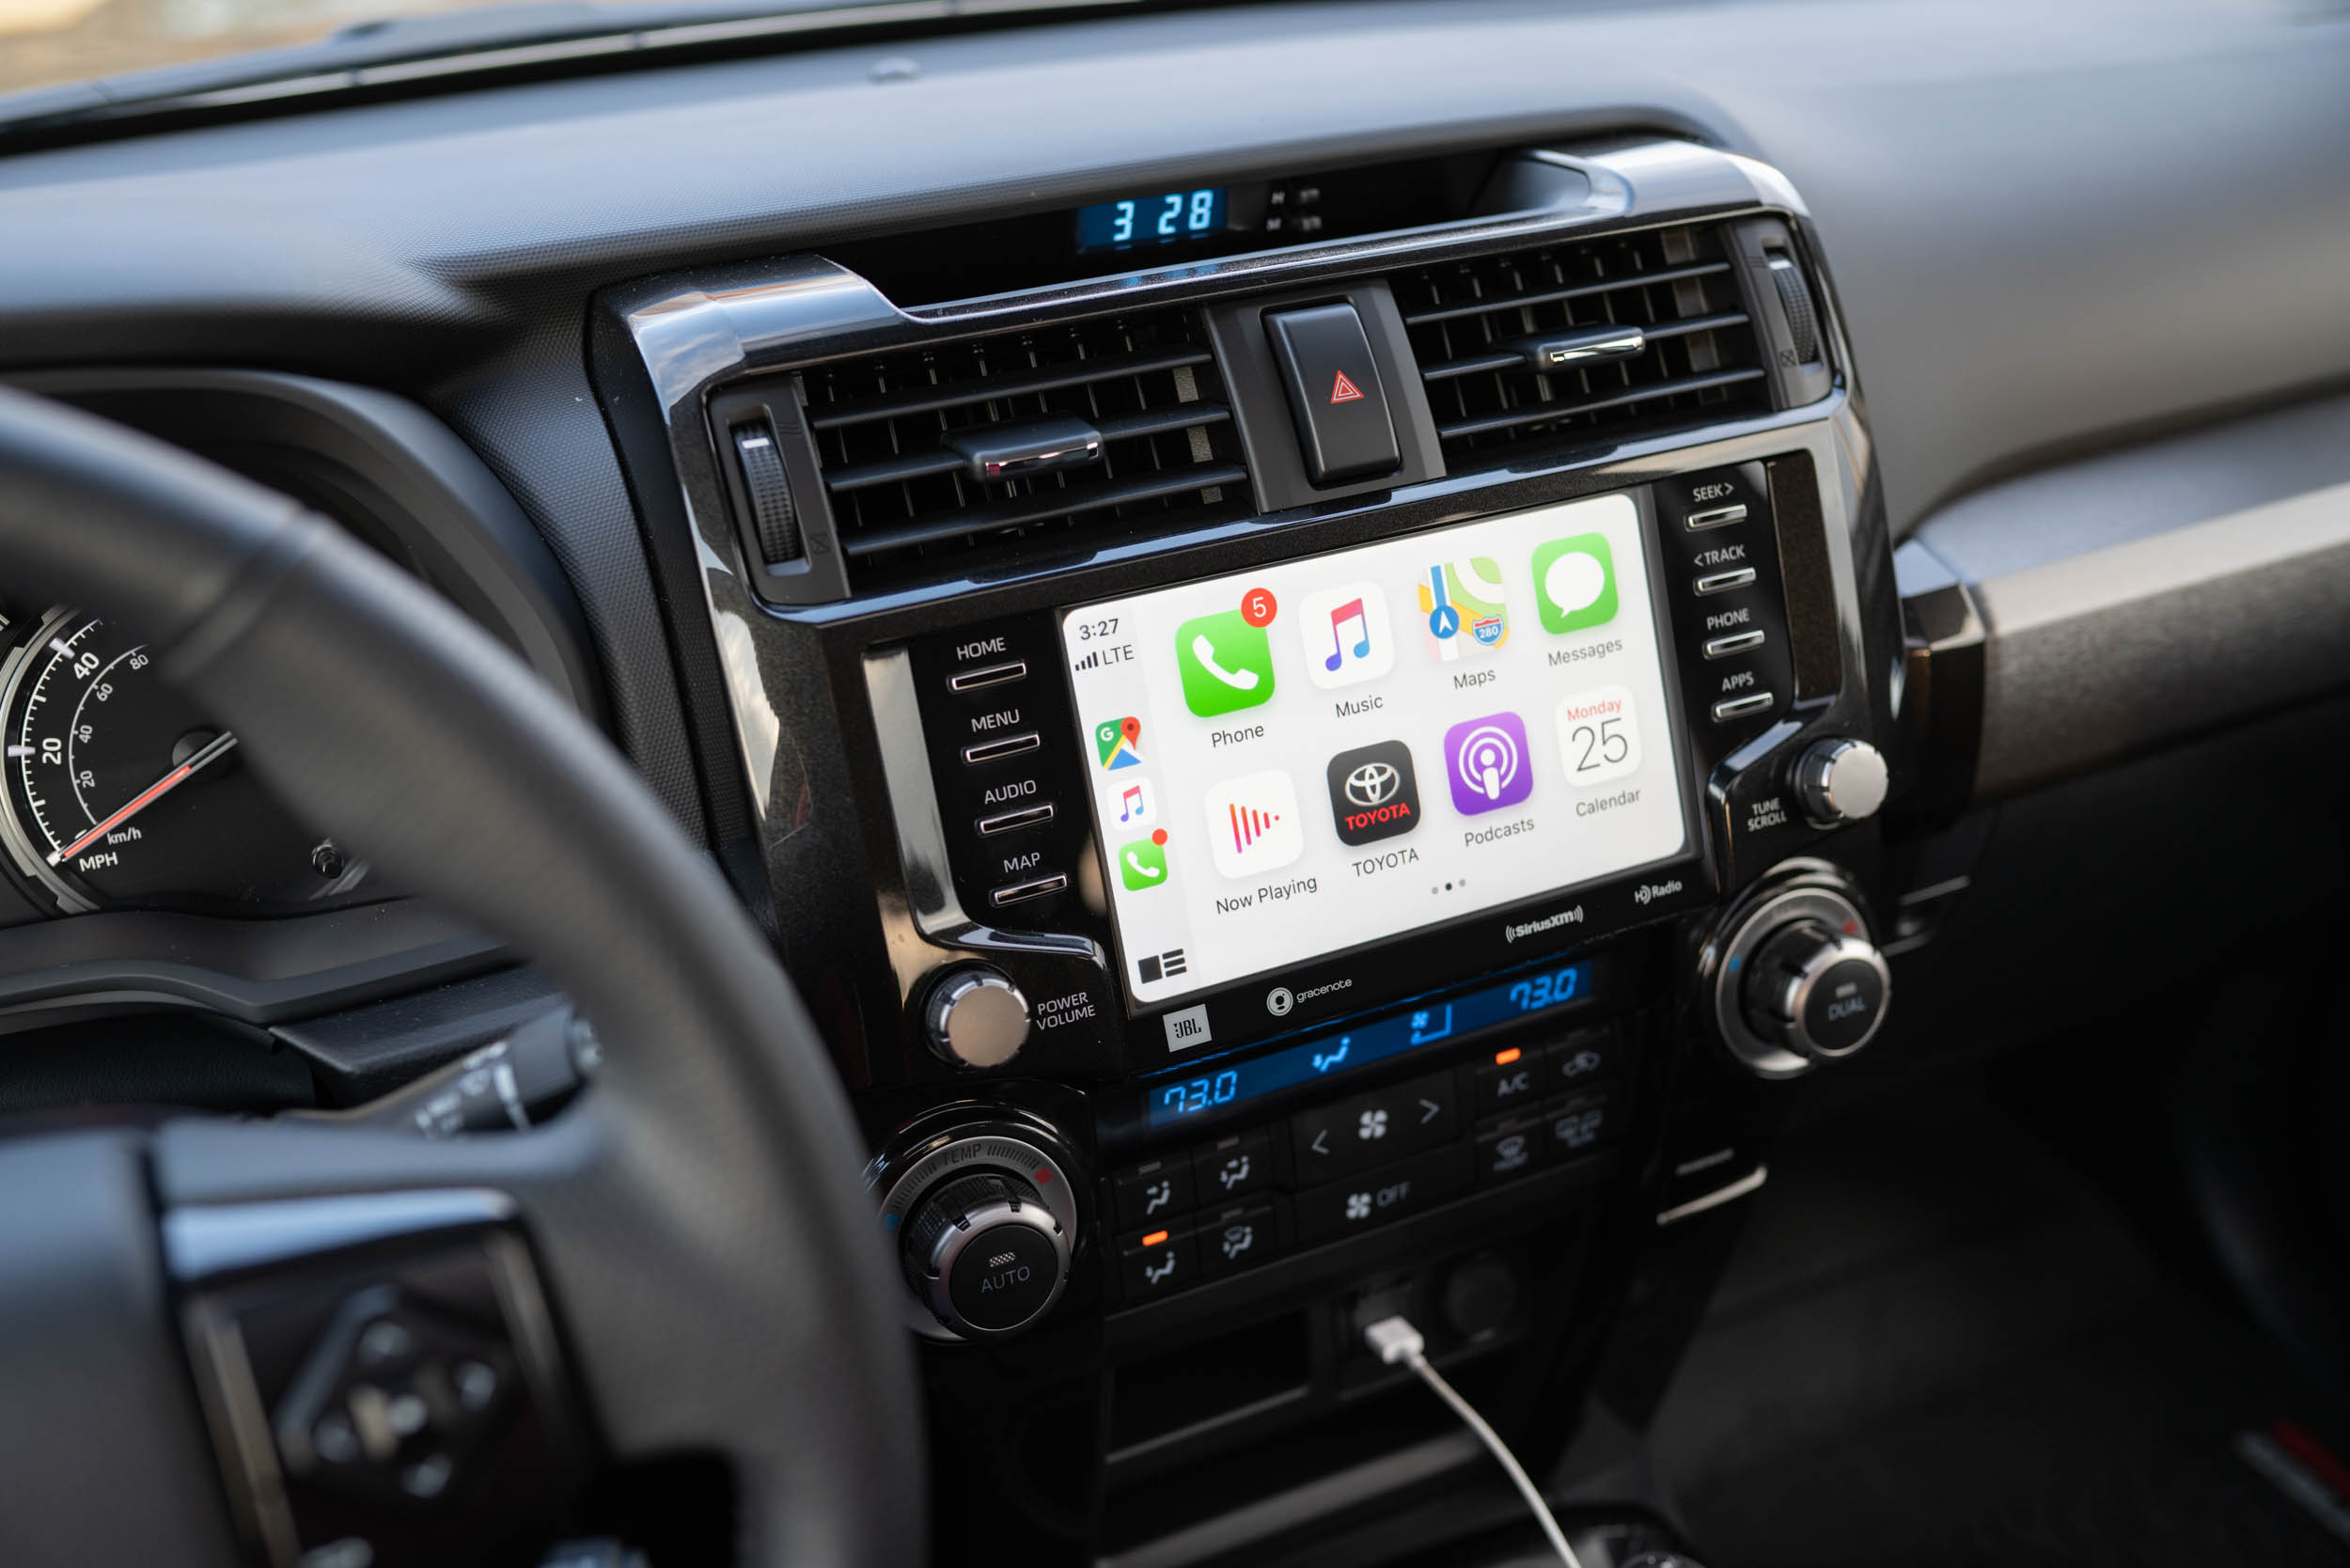 2020 Toyota 4Runner Infotainment Center